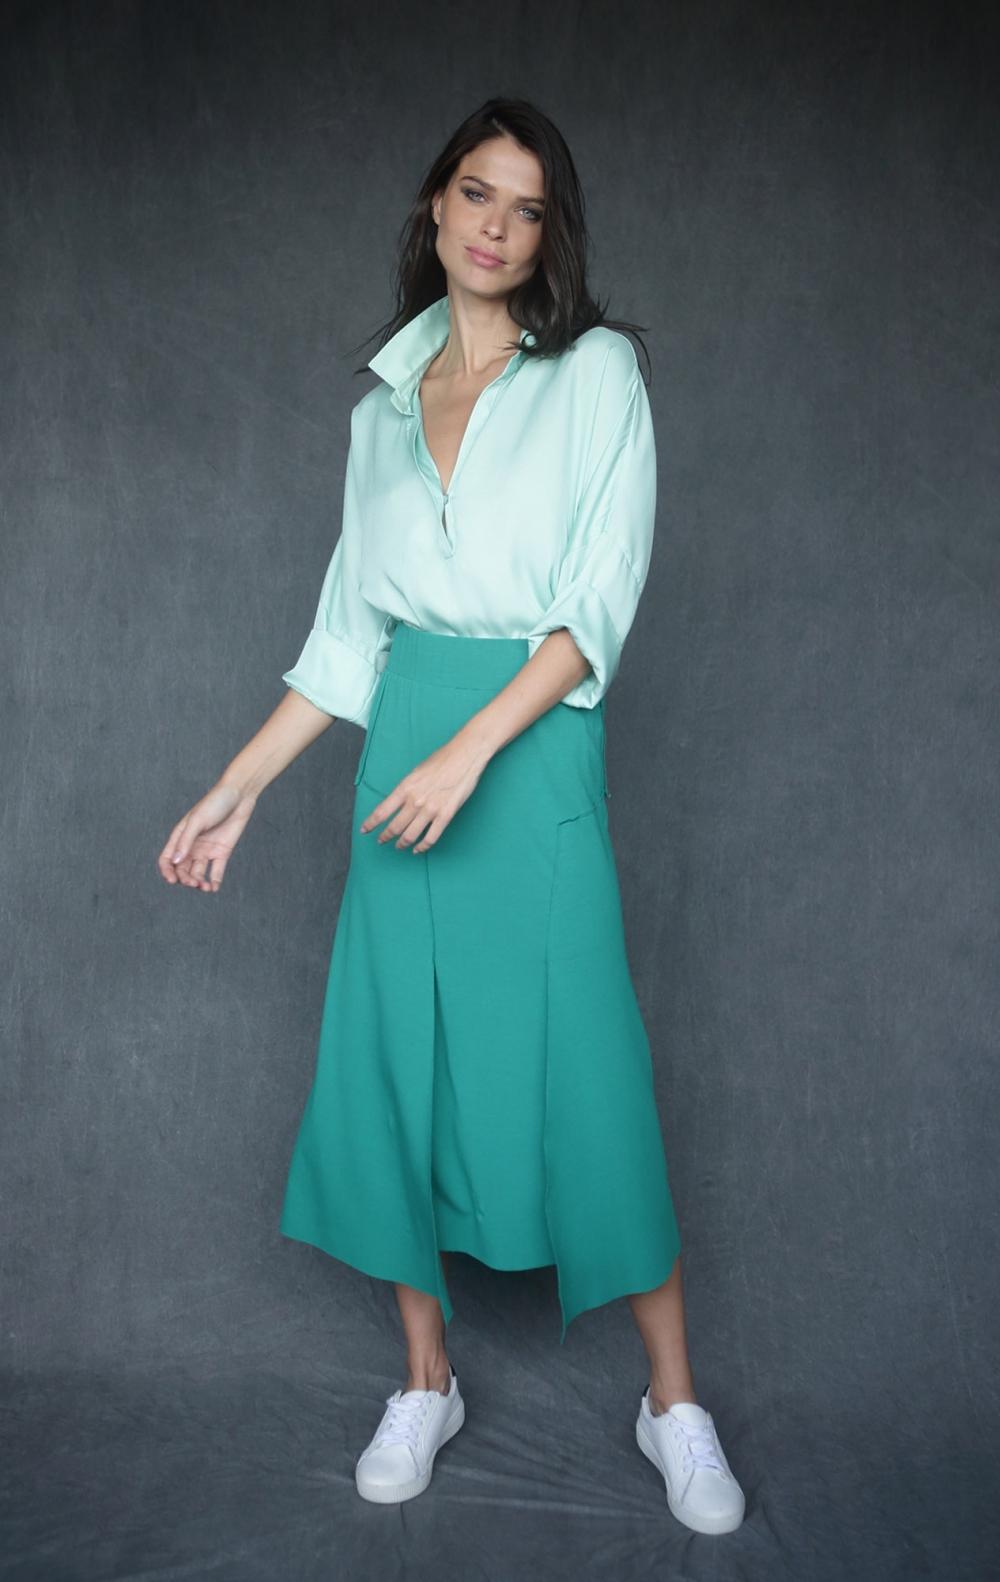 Camisa Polo Verde  - Foto 1